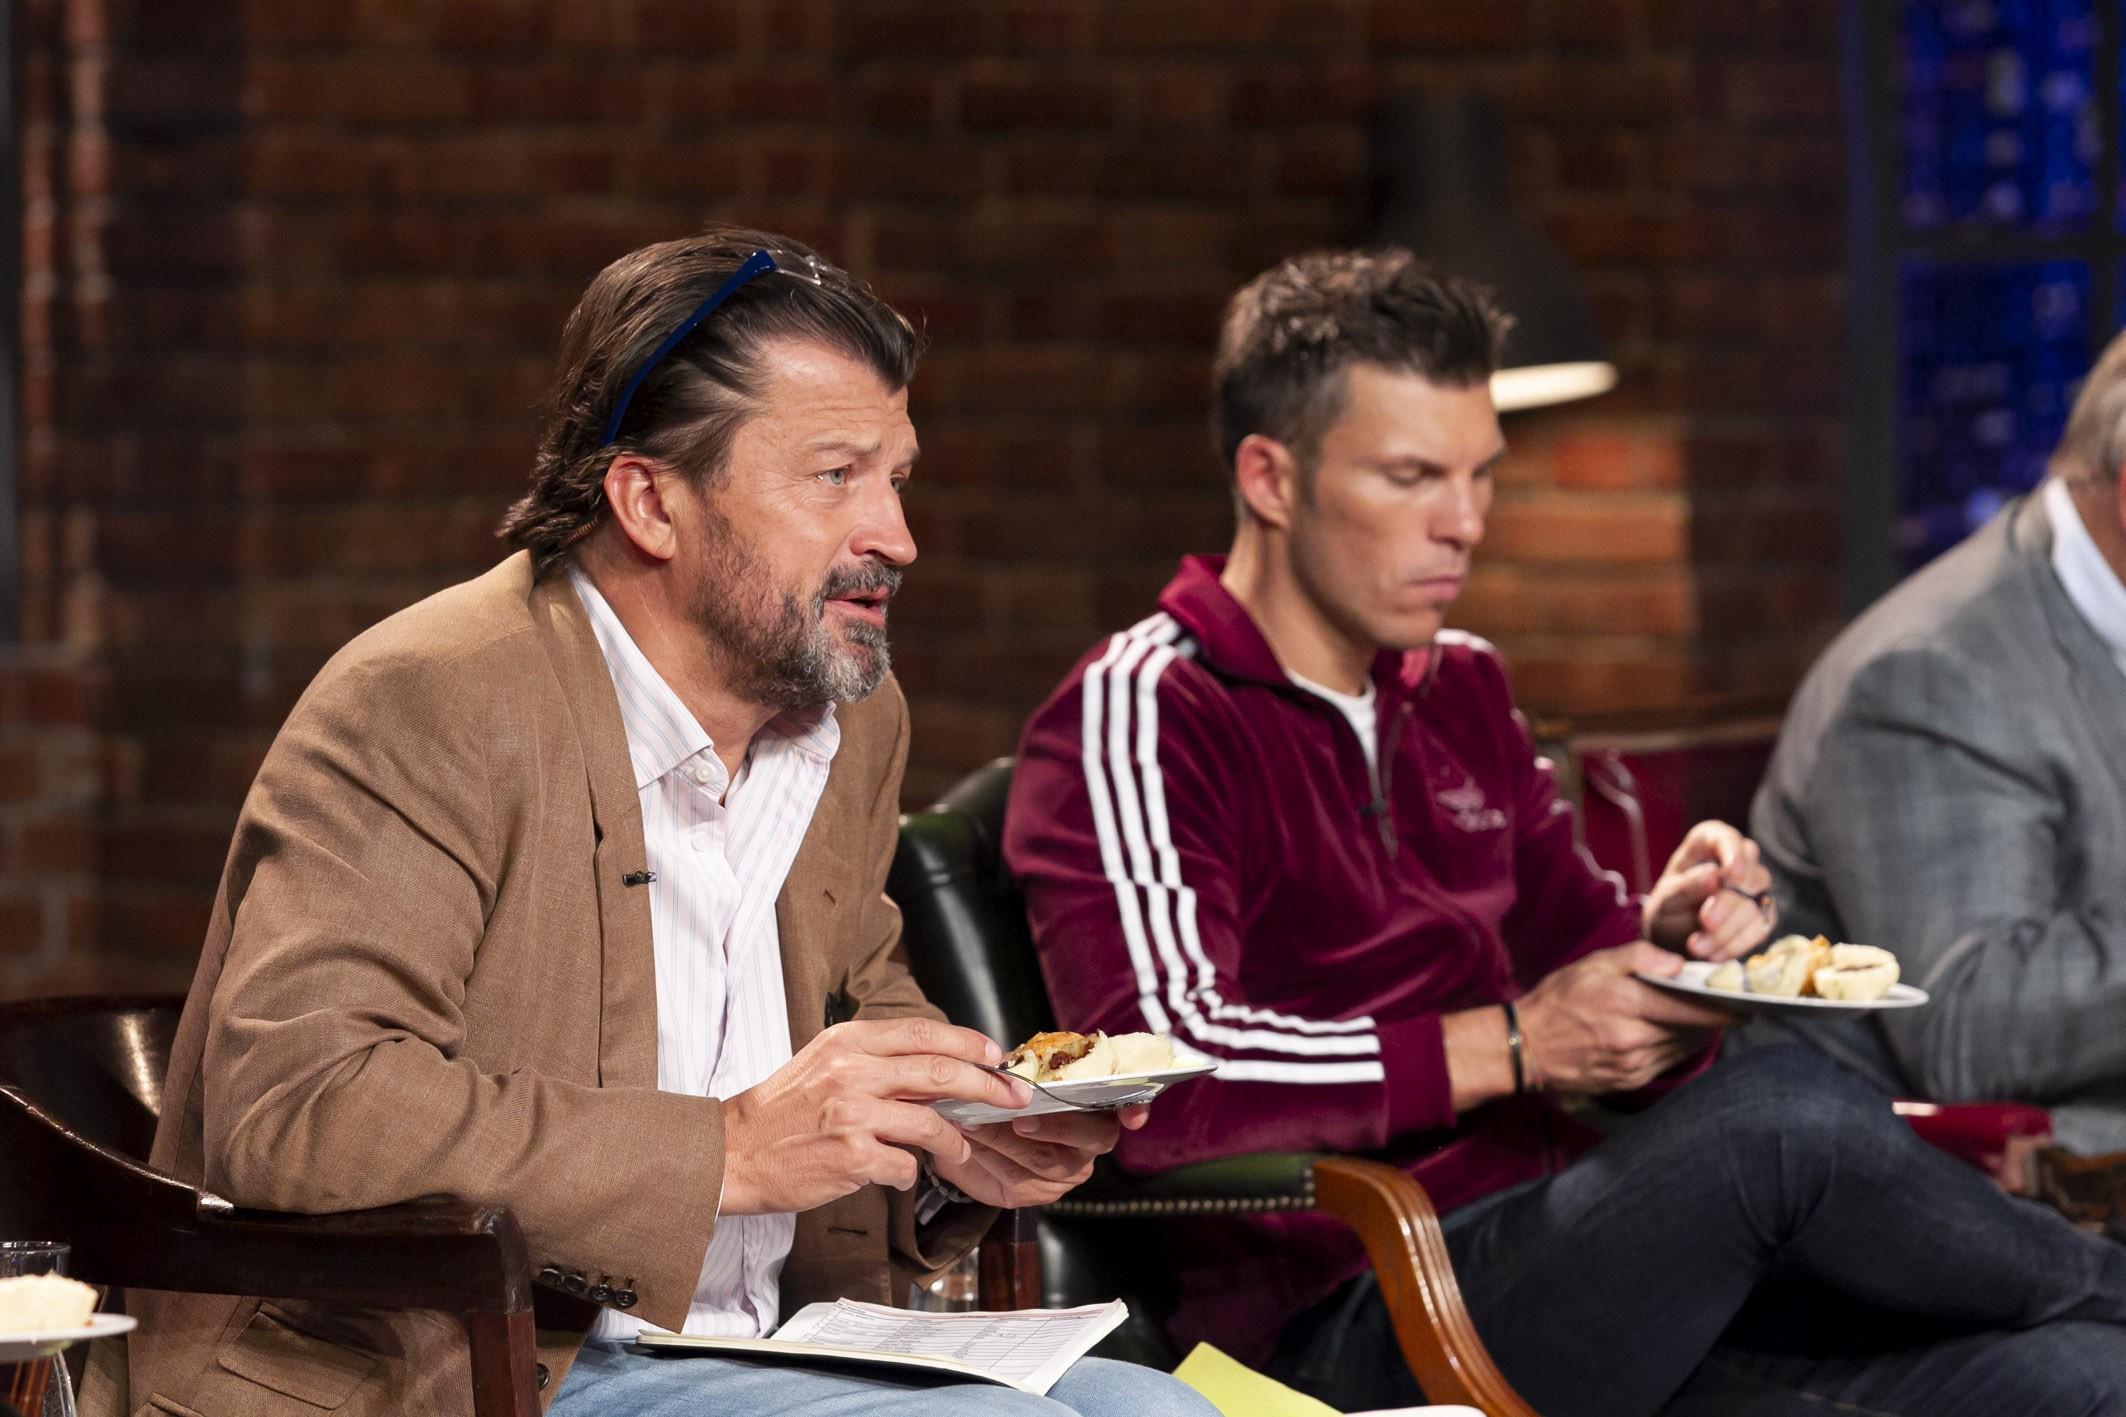 """2 Minuten 2 Millionen"", Martin Rohla, Katharina Schneider, Leo Hilinger, Hans Peter Haselsteiner, Florian Gschwandtner"